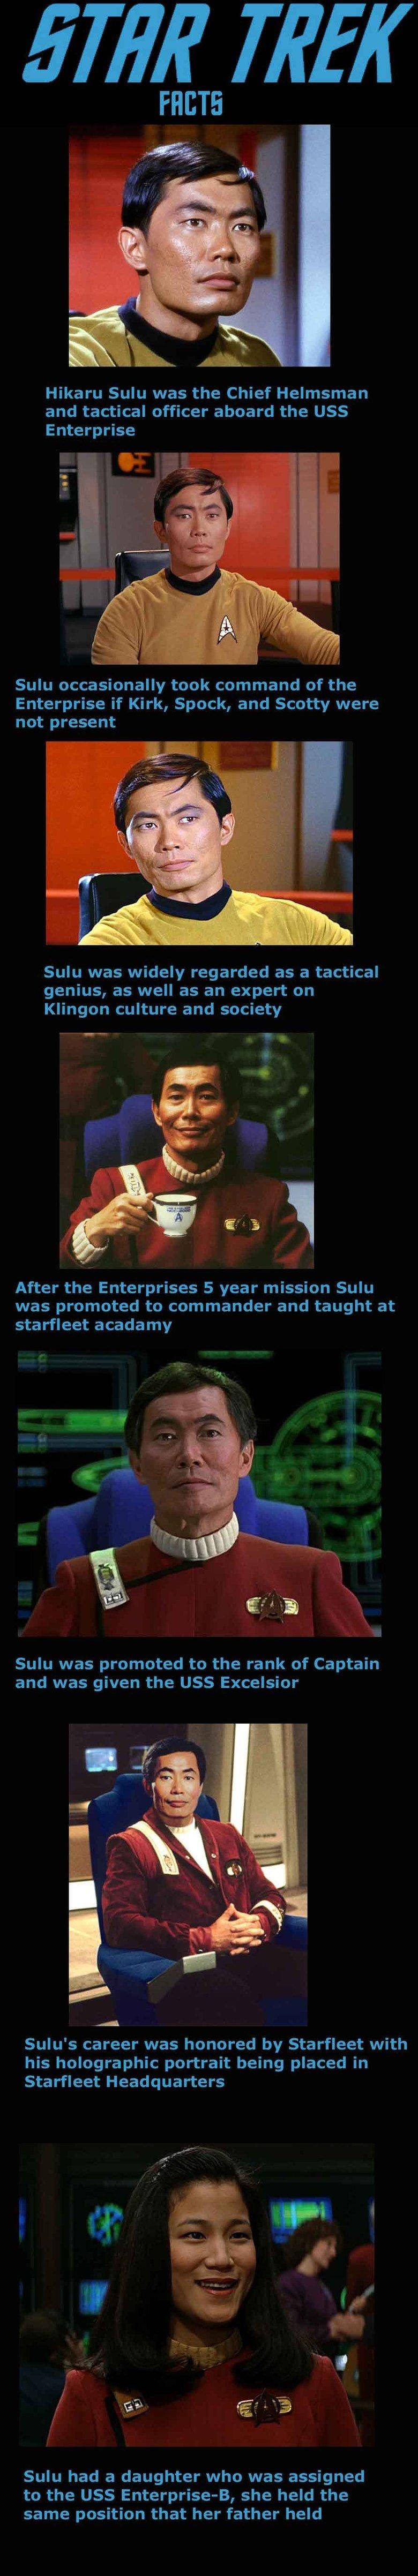 Star Trek Facts- Sulu. www.funnyjunk.com/Star+Trek+Facts-+Scotty/funny-pictures/5091120/ Scotty www.funnyjunk.com/Star+Trek+Facts-+Bones/funny-pictures/5089847/